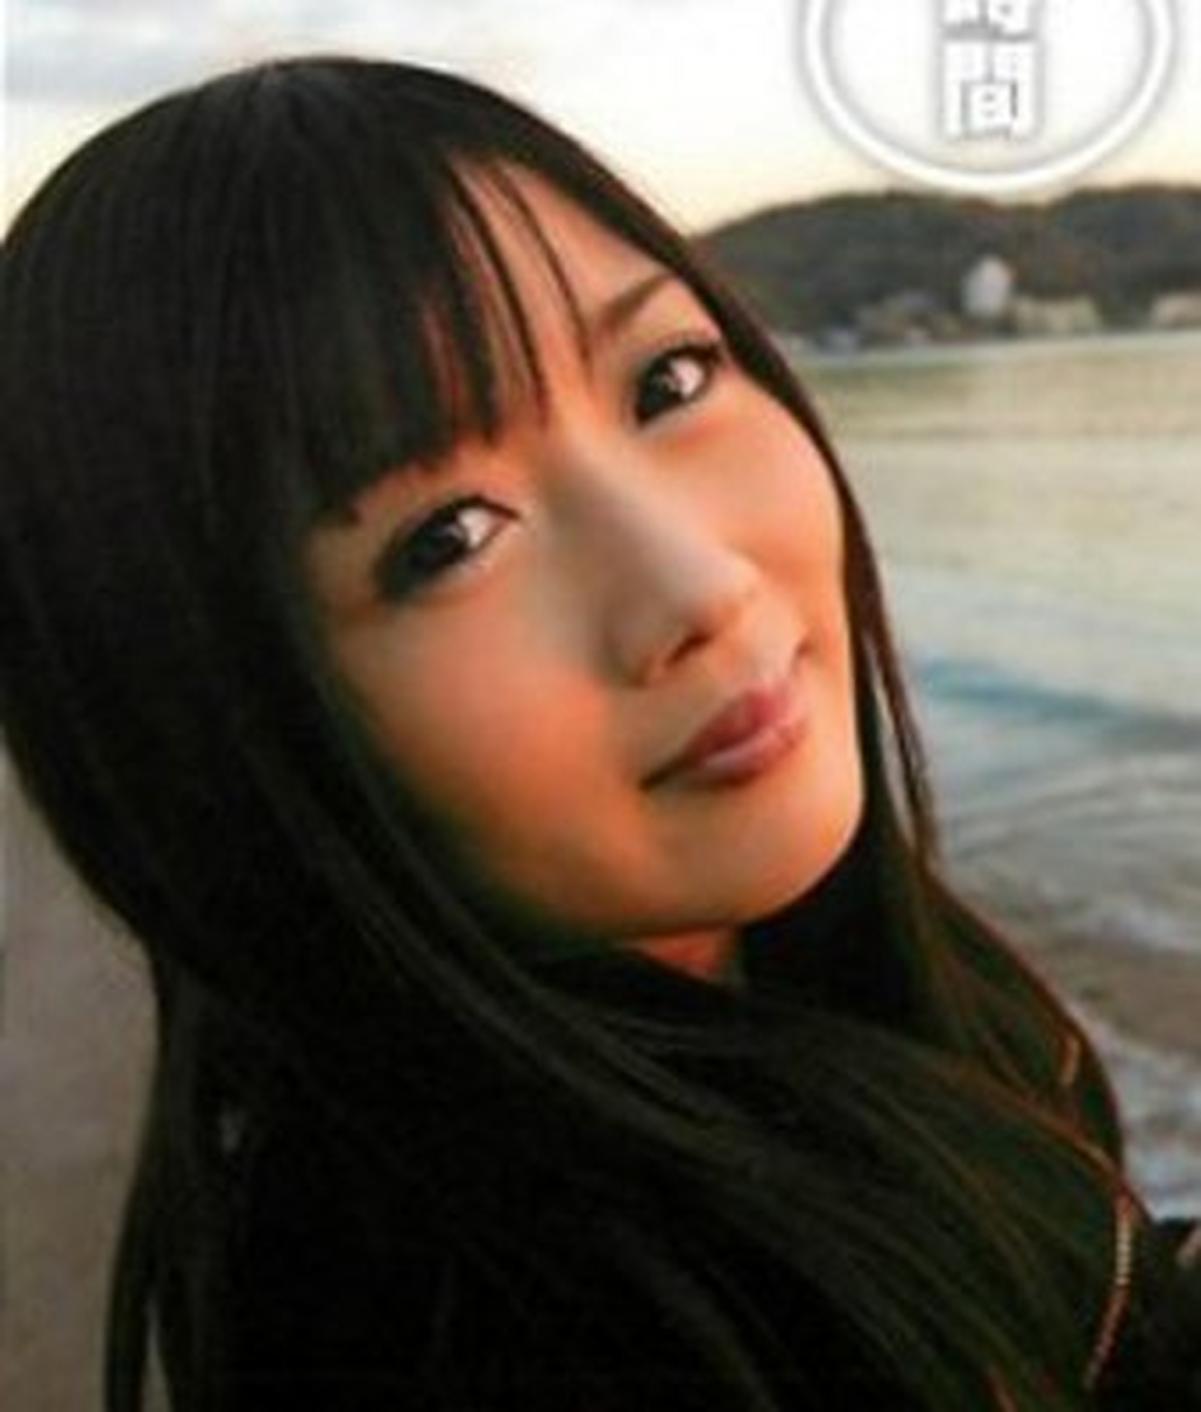 Hibiki Otsuki wiki, Hibiki Otsuki bio, Hibiki Otsuki news